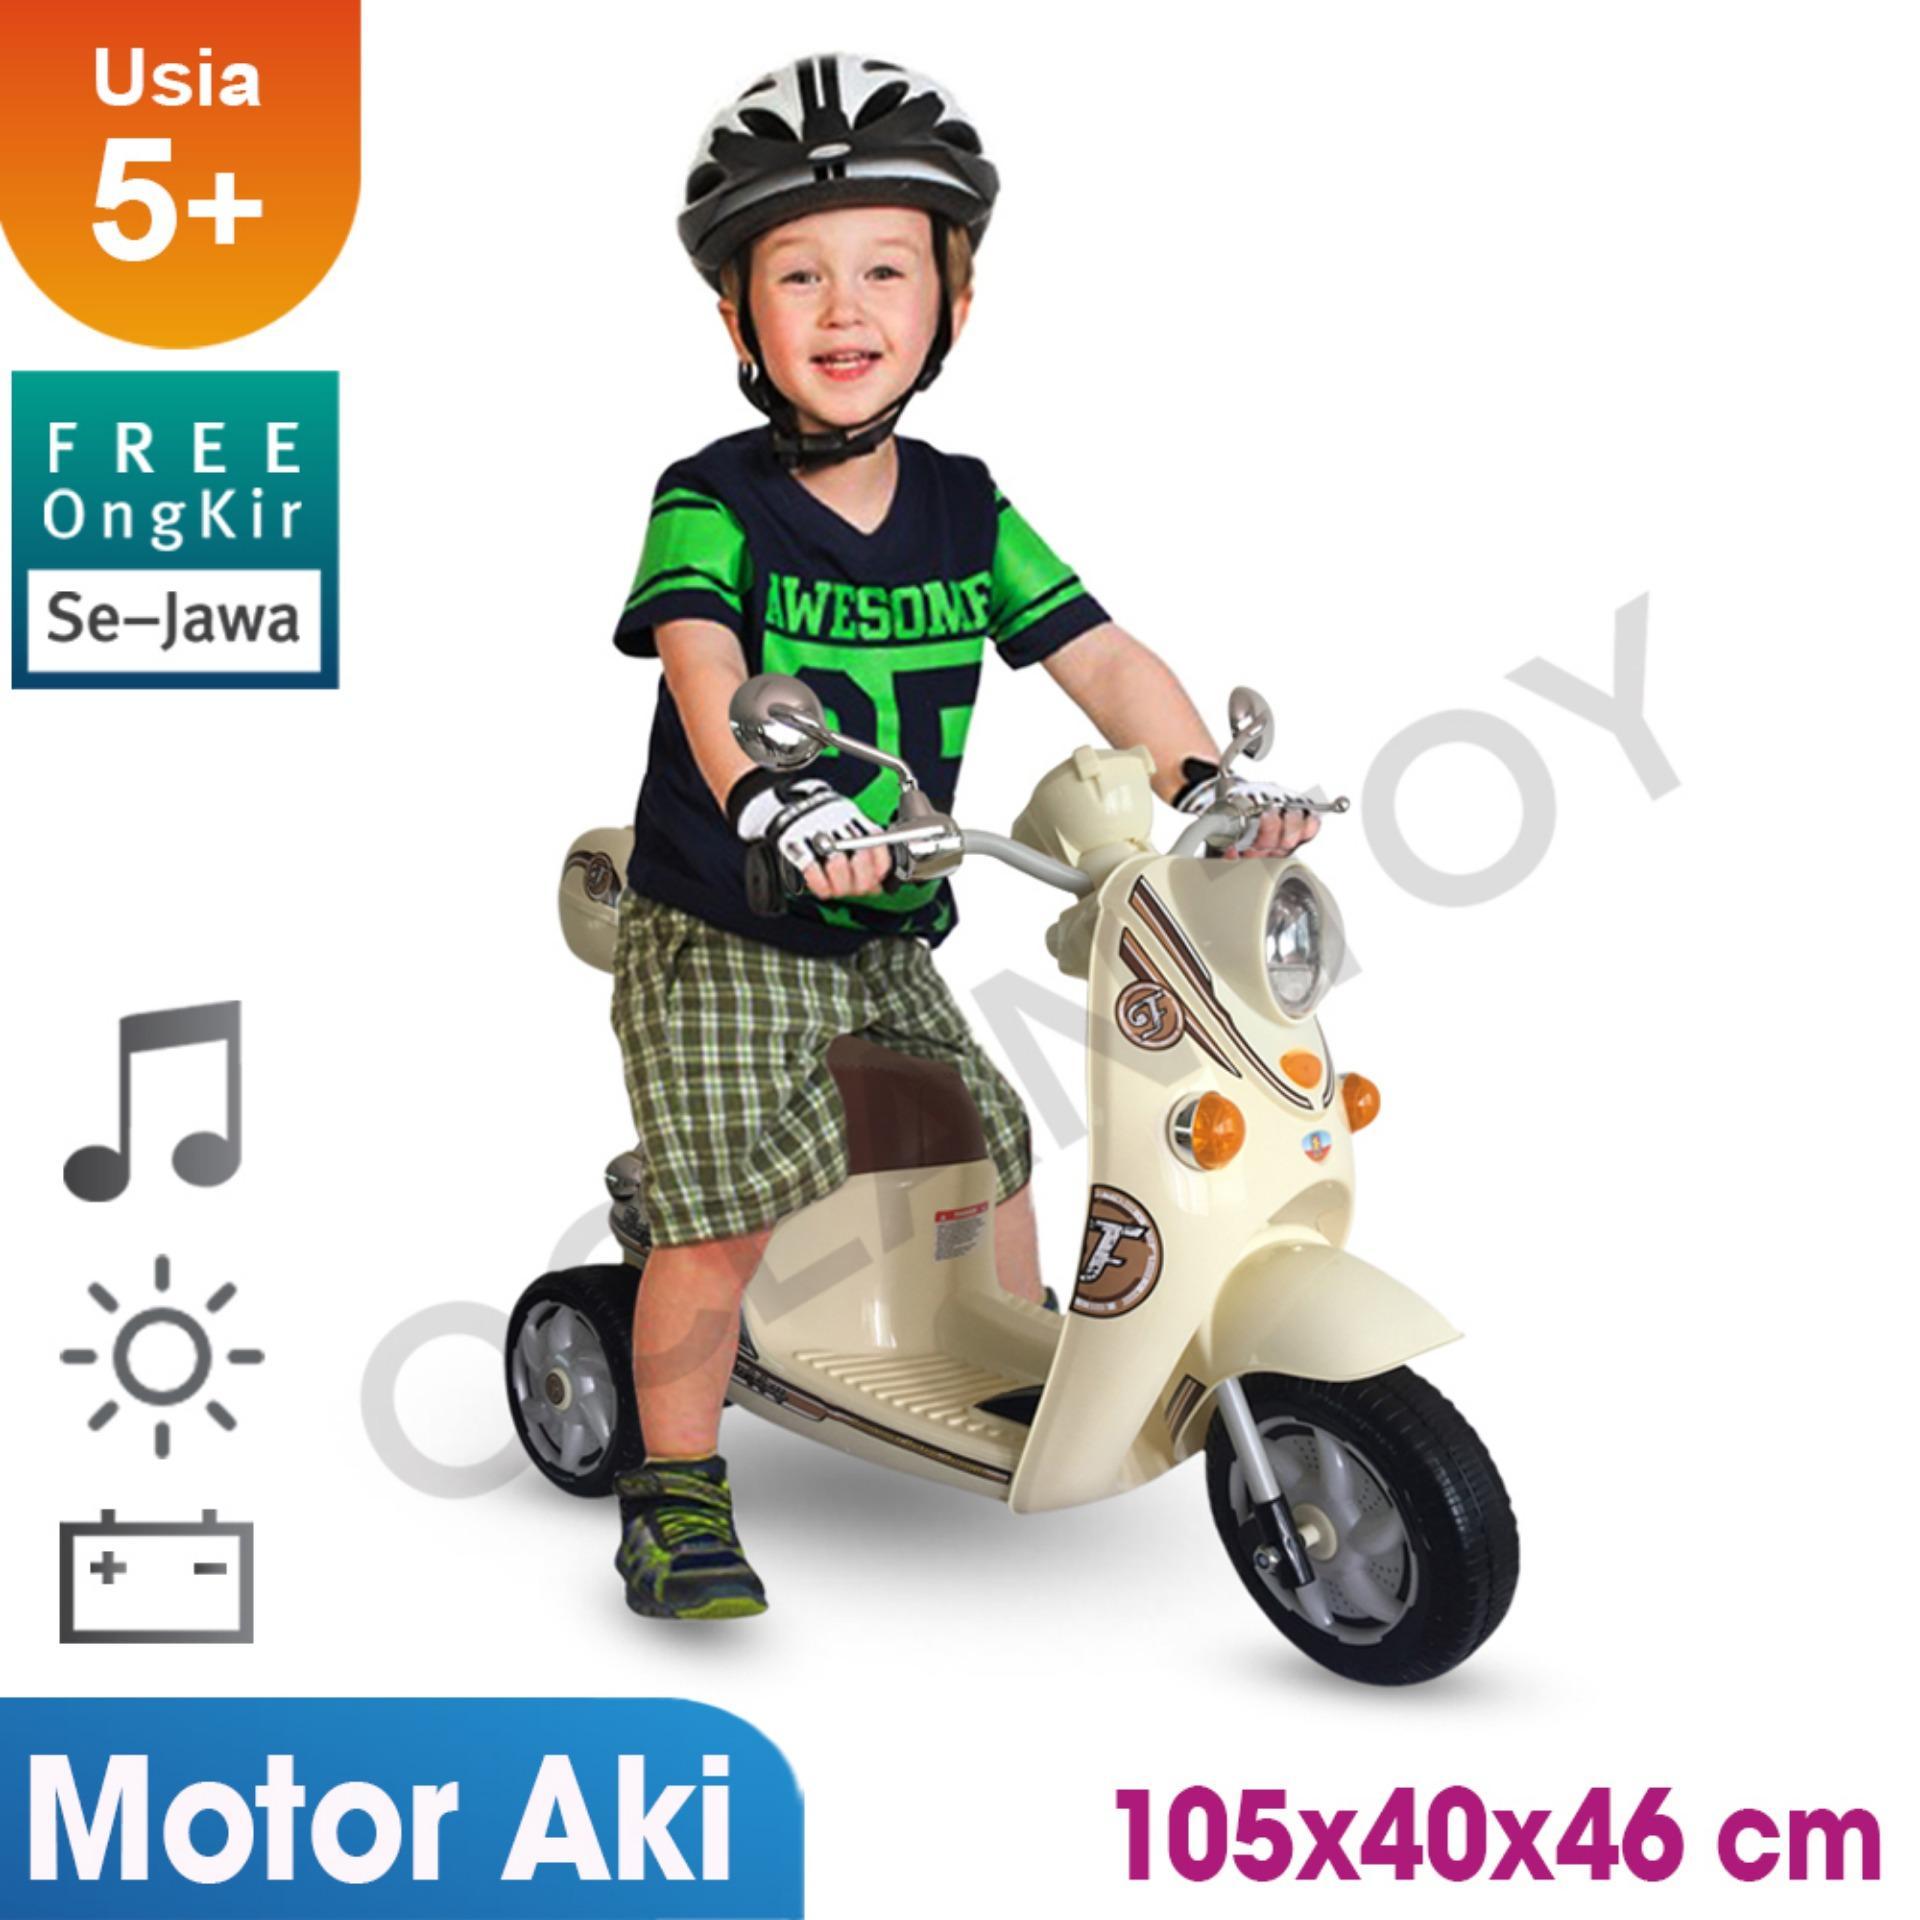 Motor Scoopy / 100% Free Ongkir Khusus Pulau Jawa / Ocean Toy / Pmb / Ride On / Motor Aki Scoopy Mainan Anak M338 By Ocean Toy.